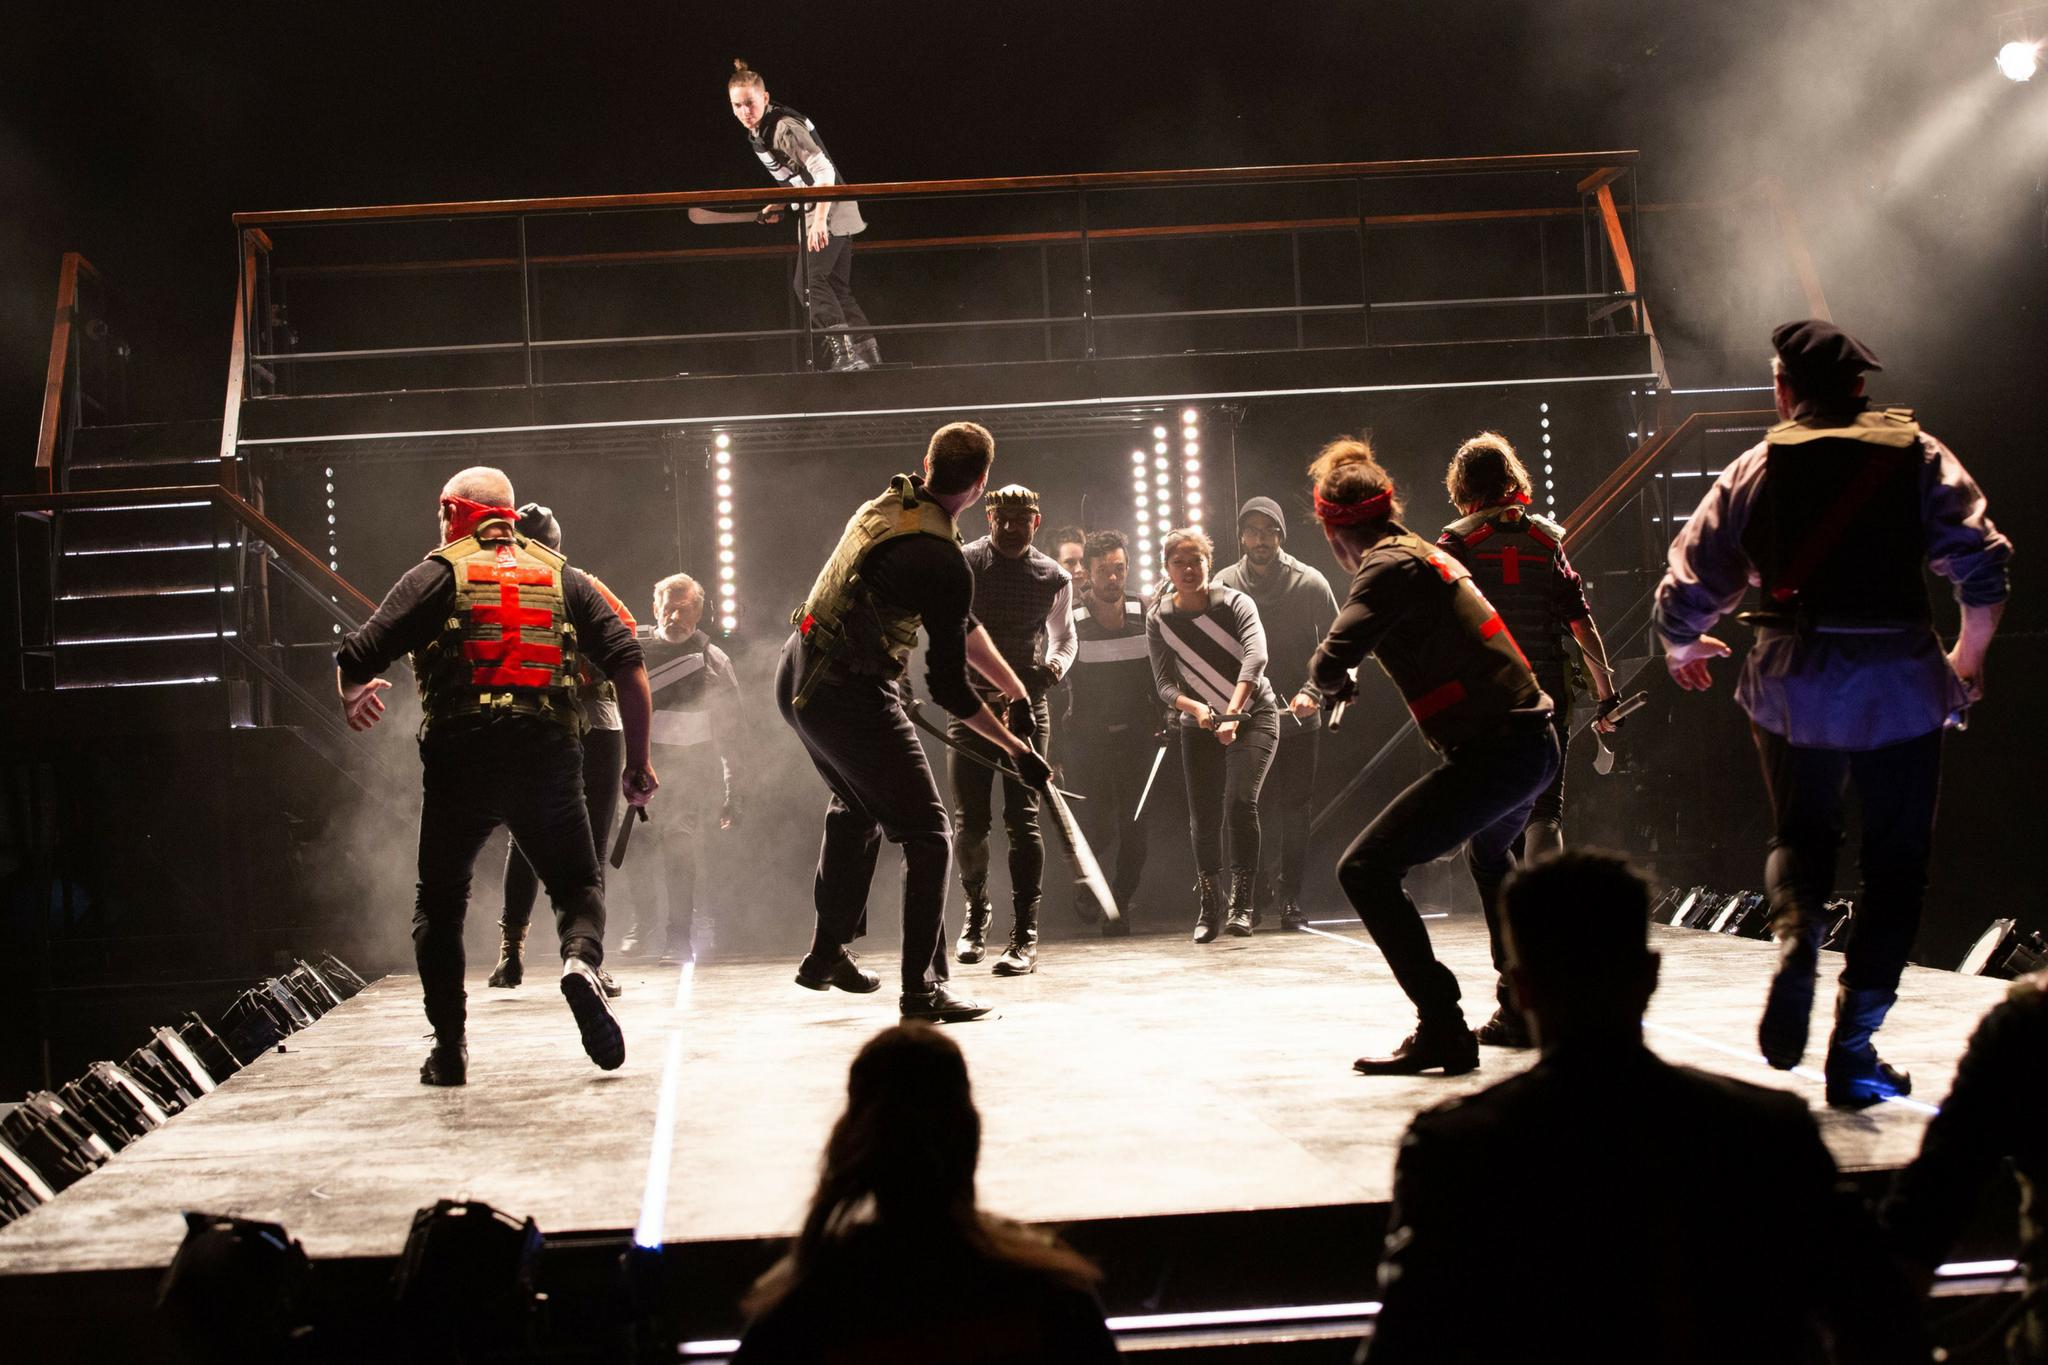 Susannah Wilson (Soldier, top platform) in Richard III, Shakespeare on the Common 2018-Photo by Evgenia Eliseeva